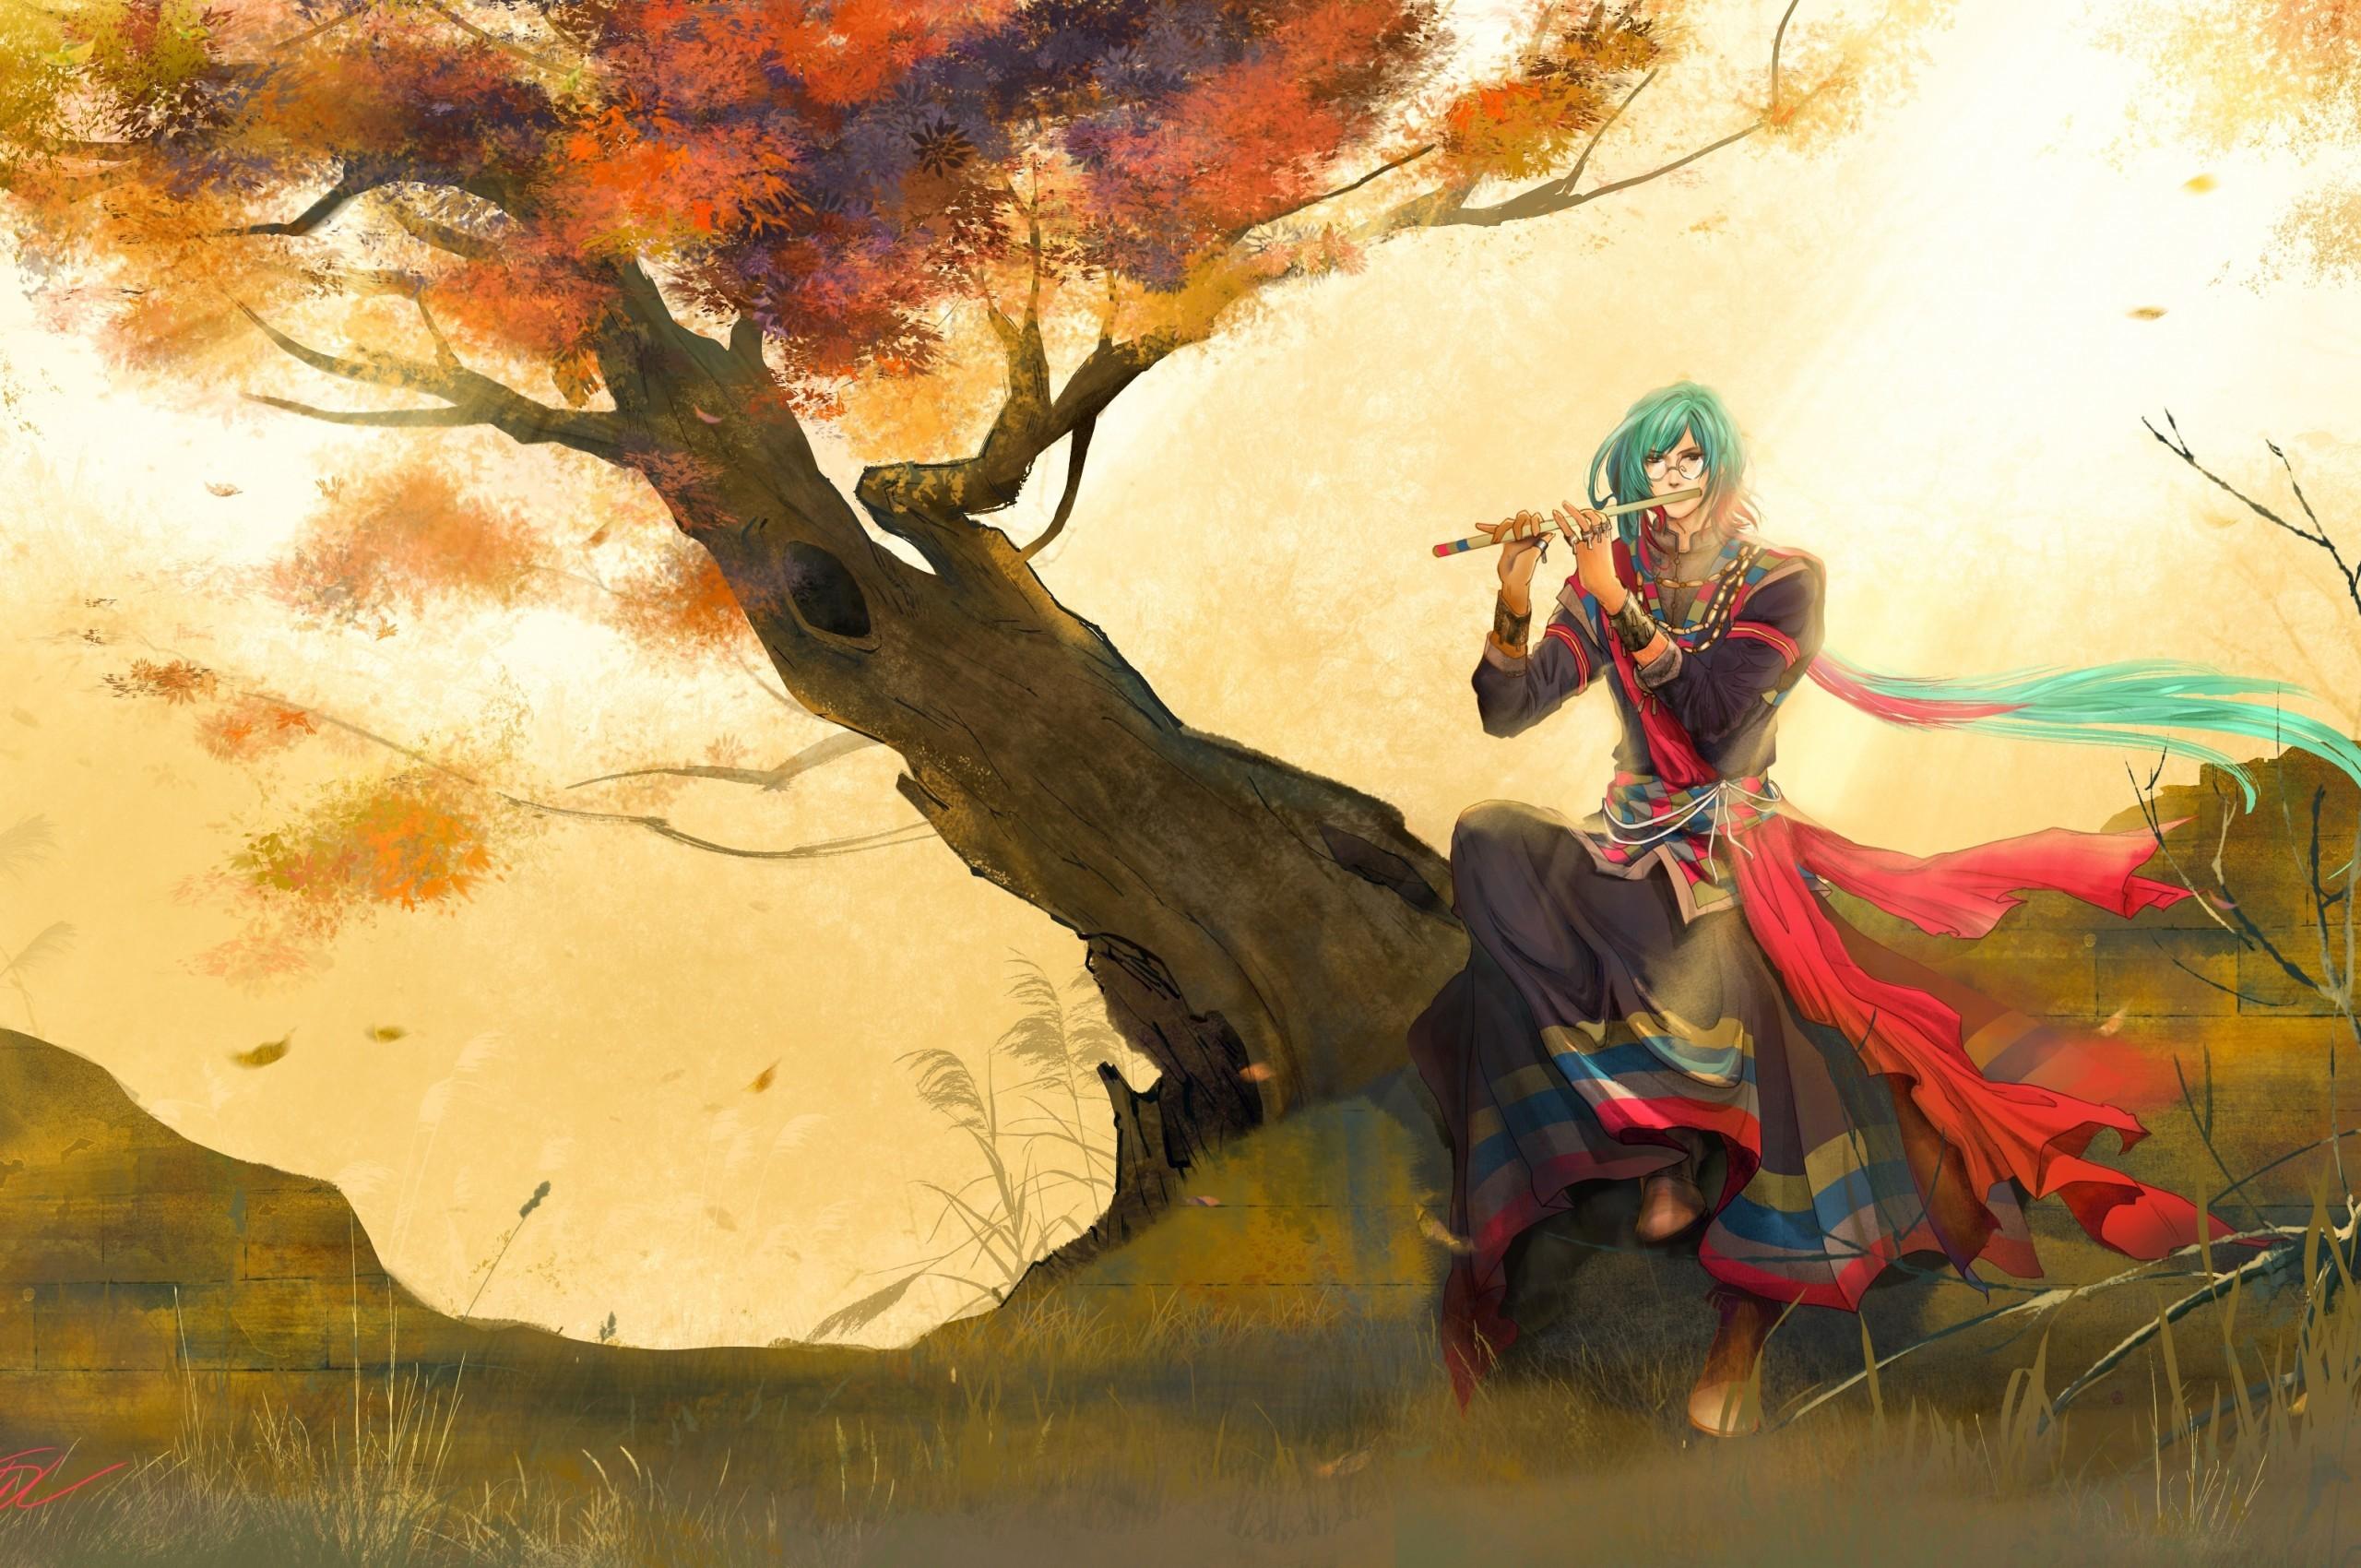 Anime Boy, Flute, Oriental, Fall, Long Hair, Tree, Scenic,